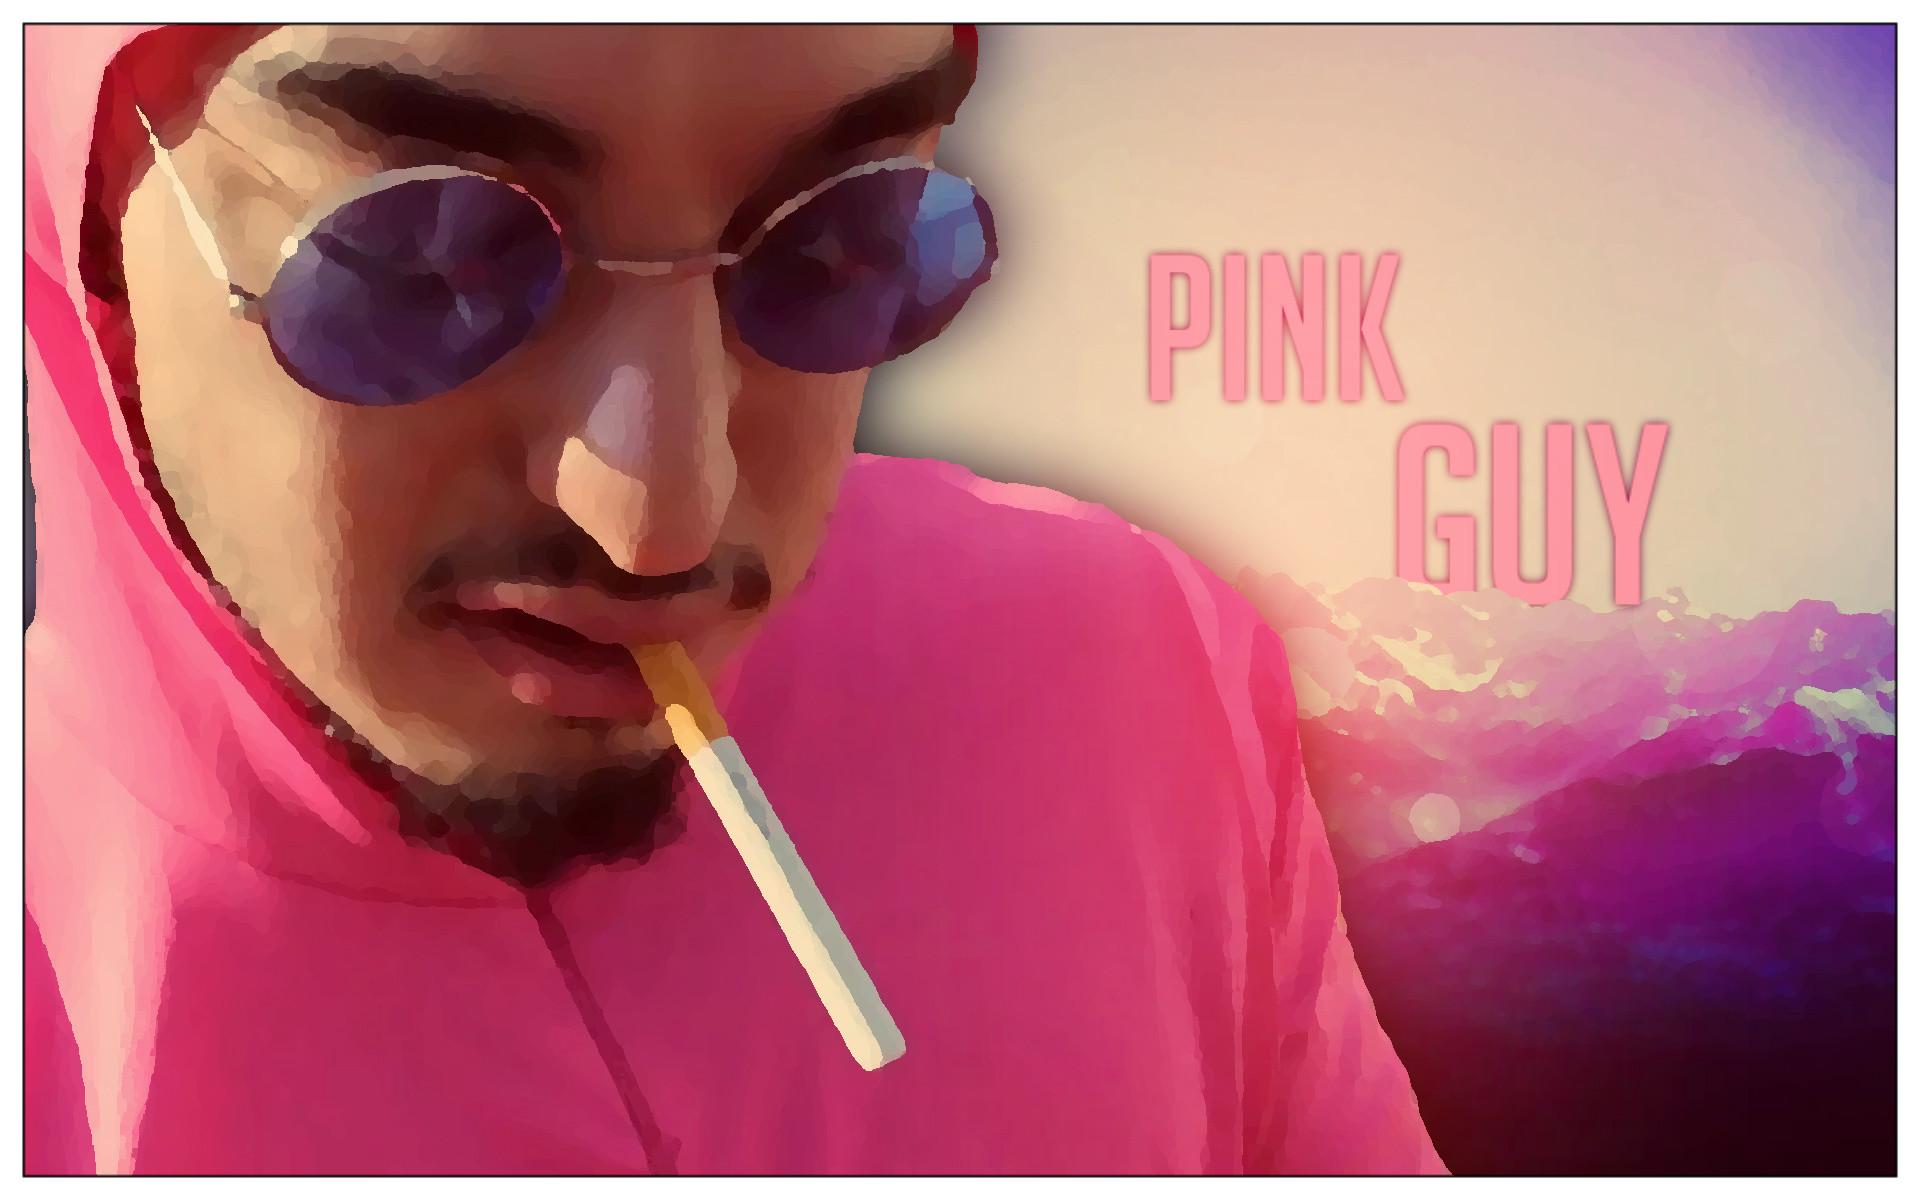 Pink Guy Wallpaper I made …